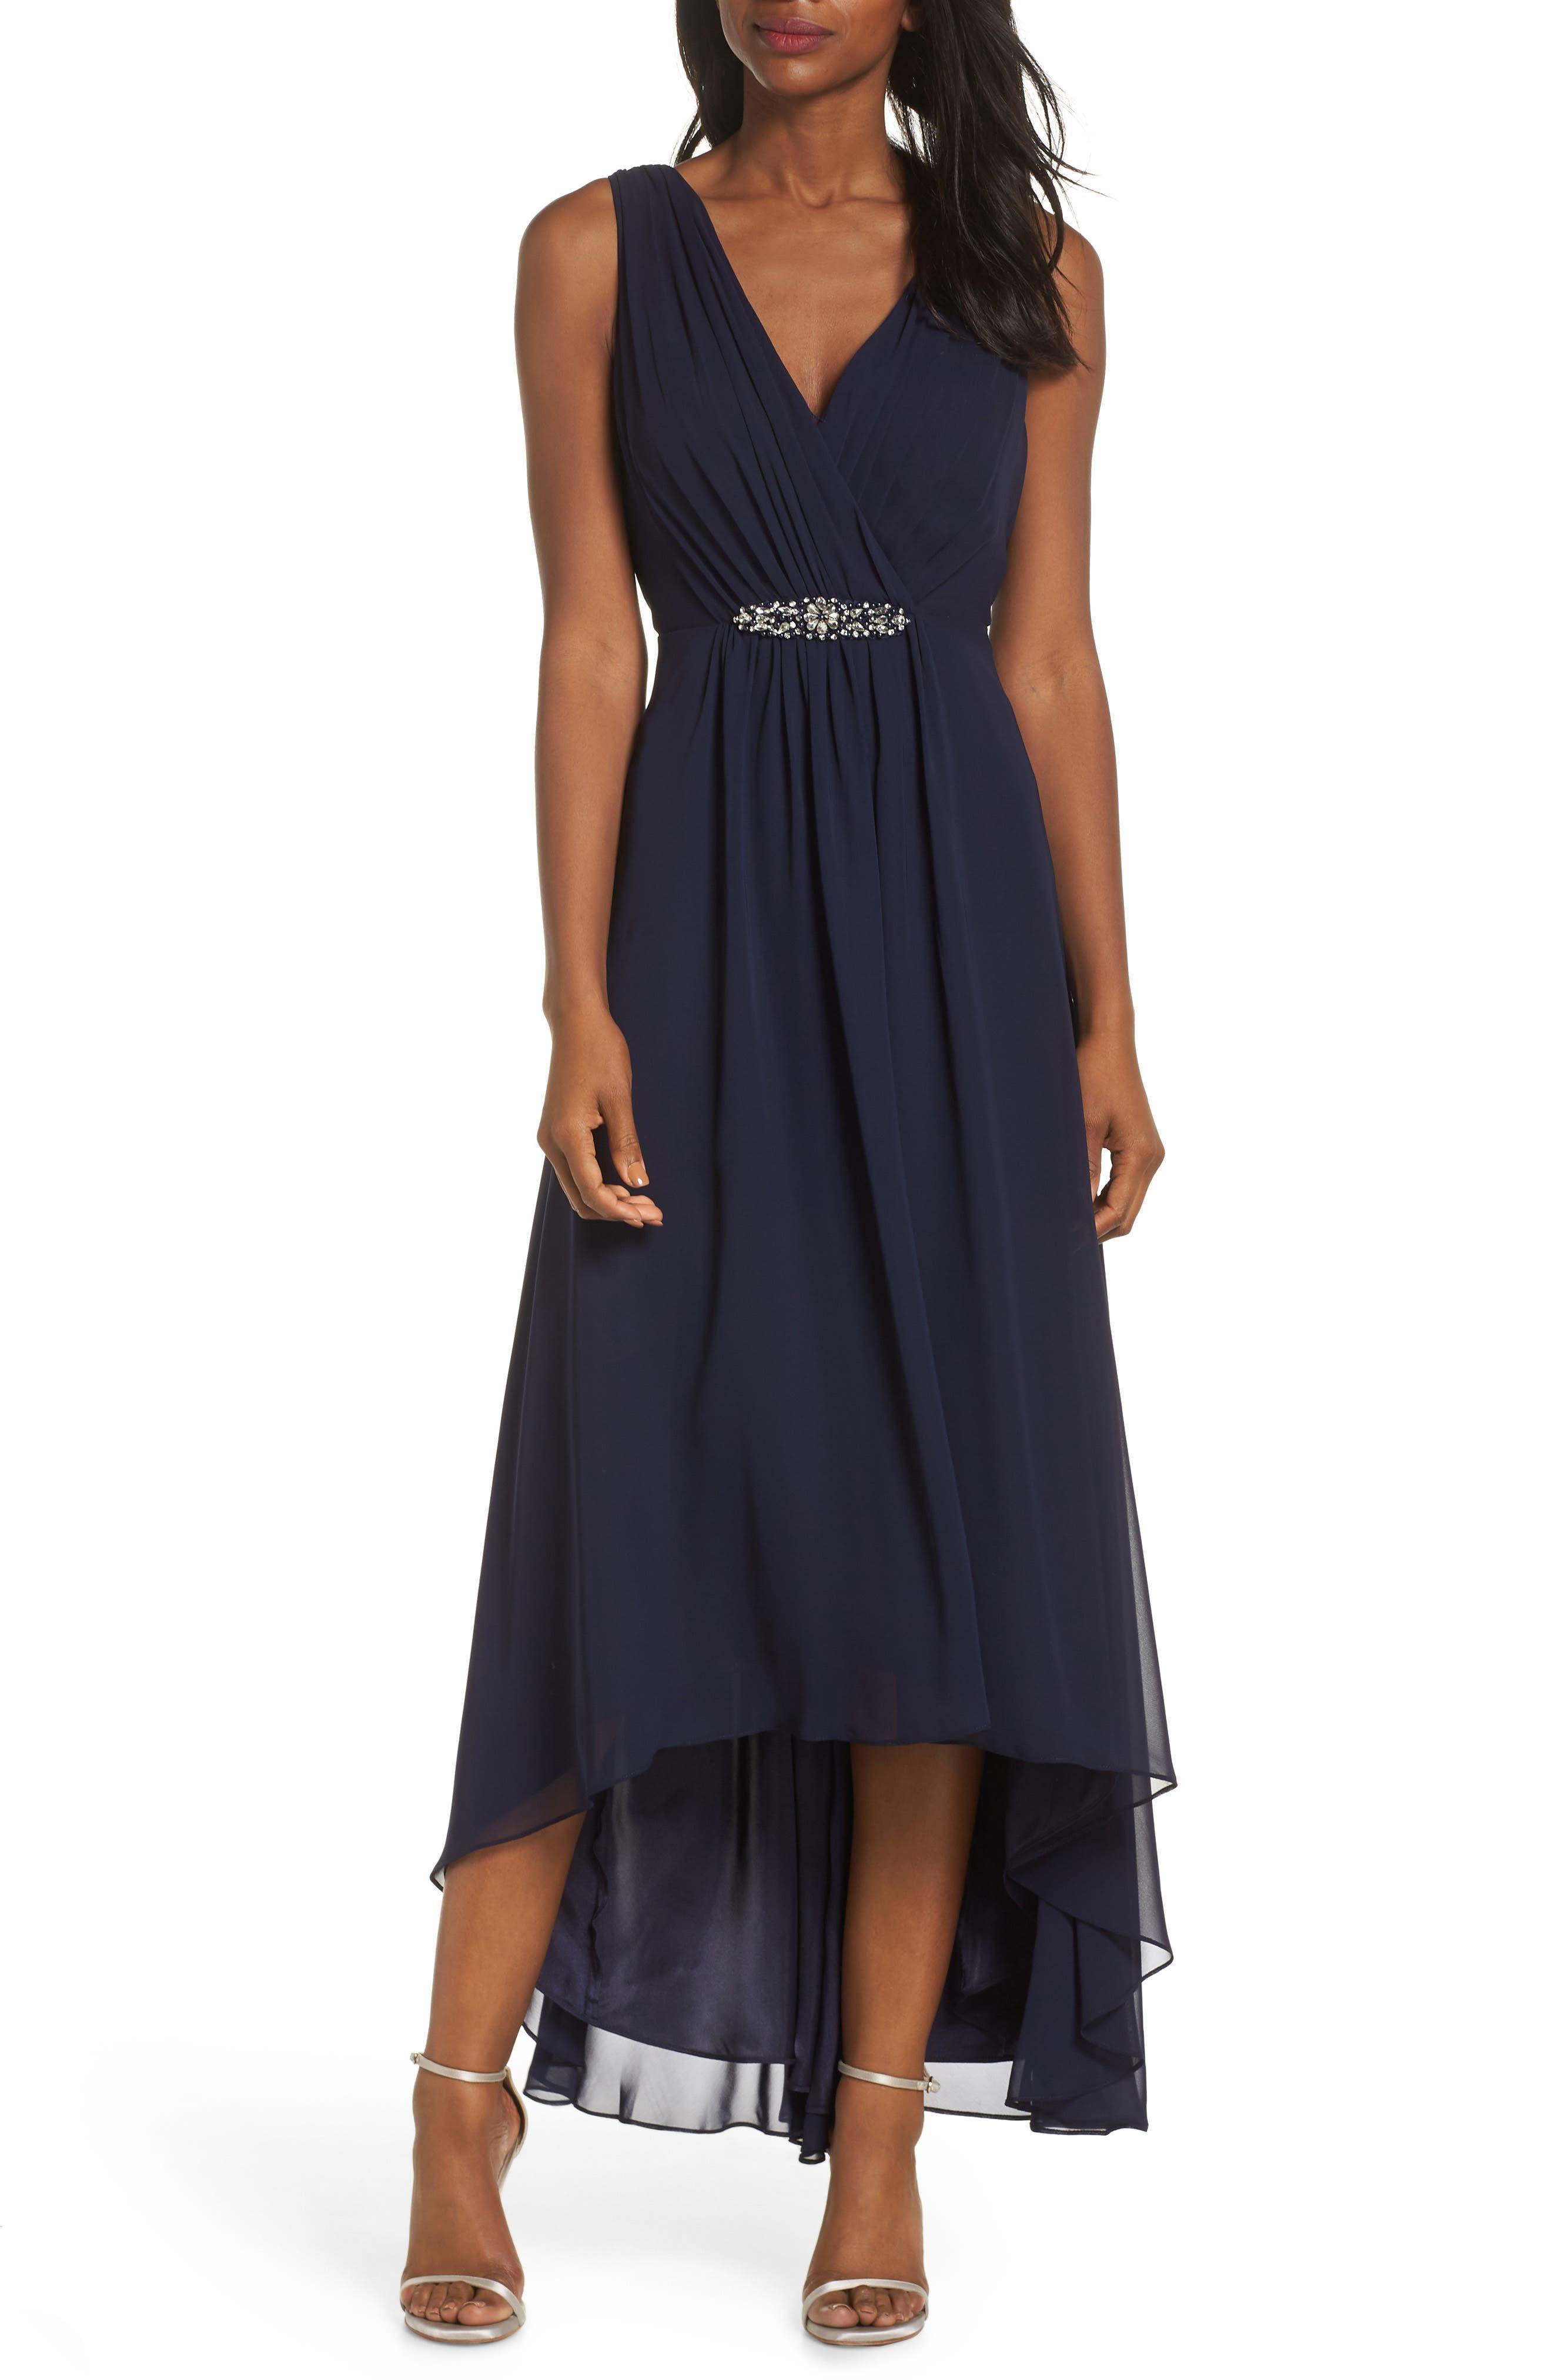 ELIZA J, Wrap Look High/Low Chiffon Dress, Main thumbnail 1, color, NAVY